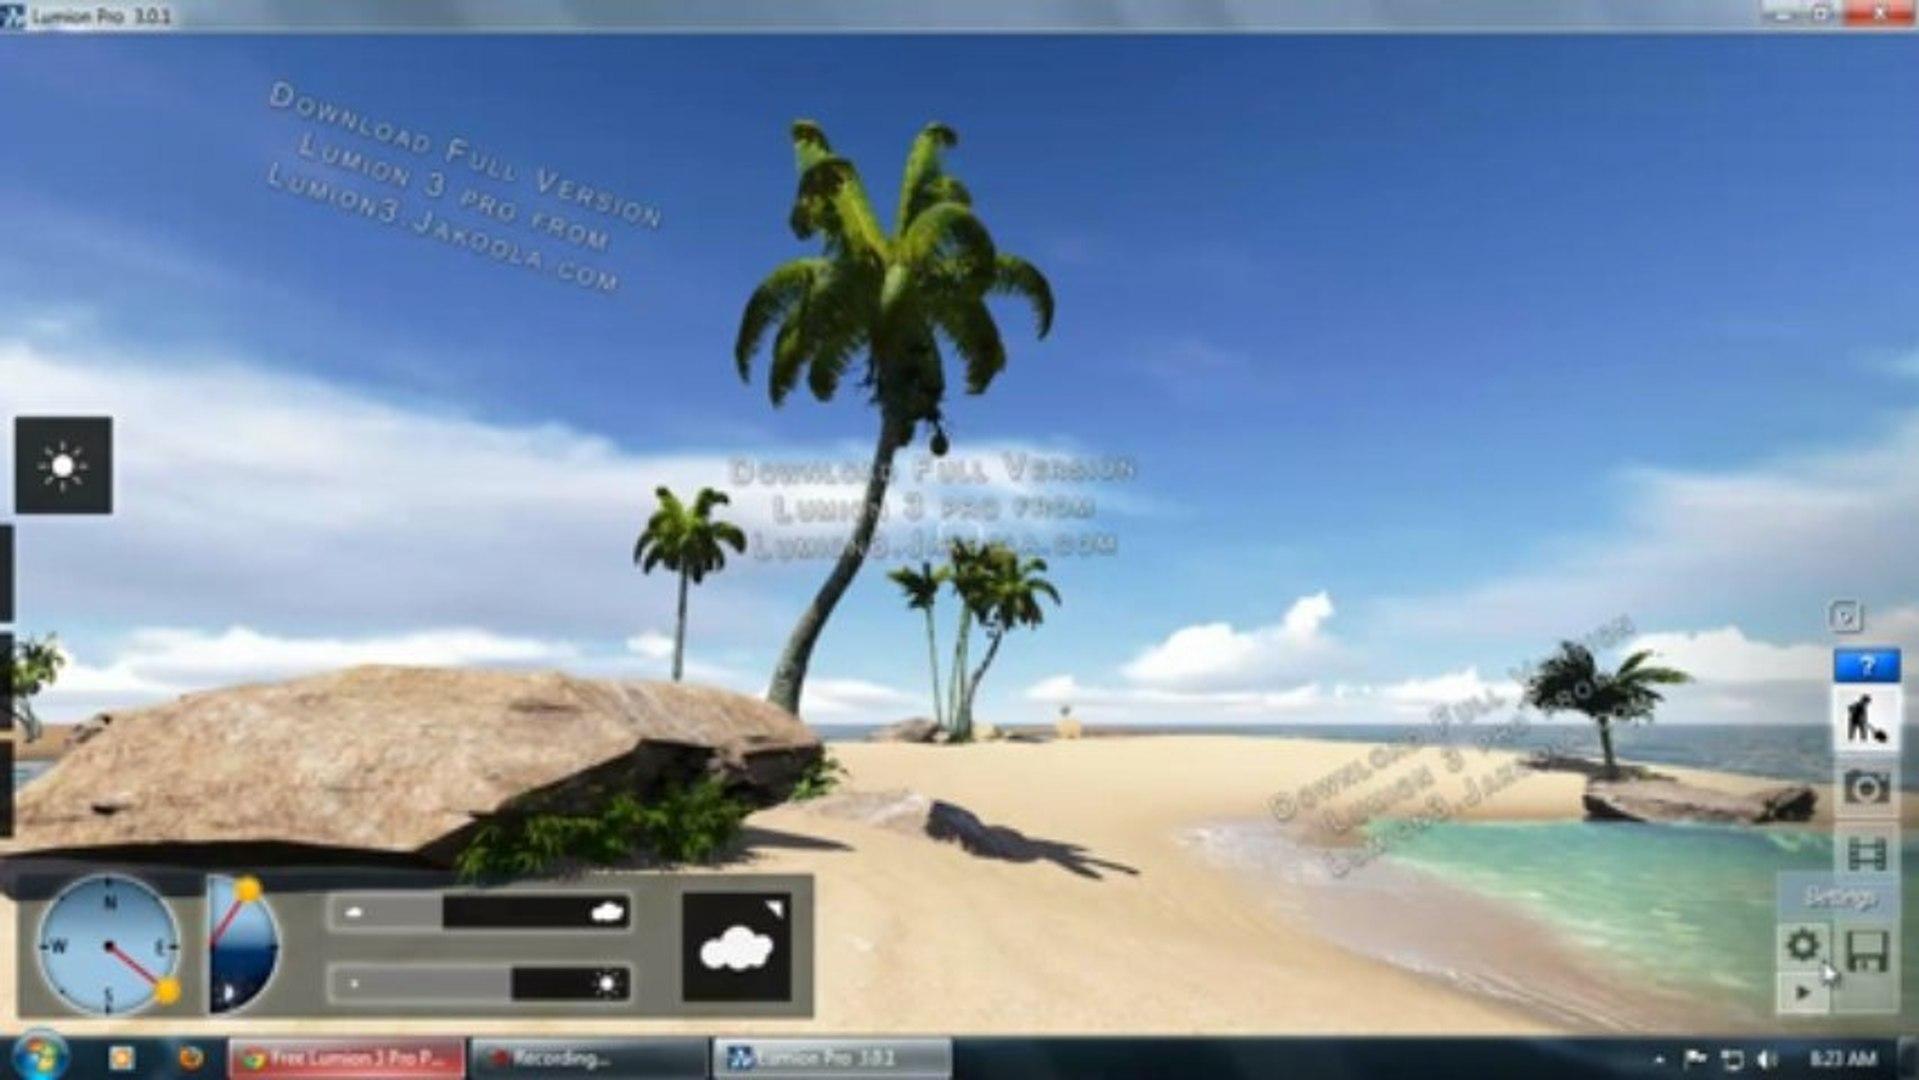 Download Lumion 3 Pro Full Version